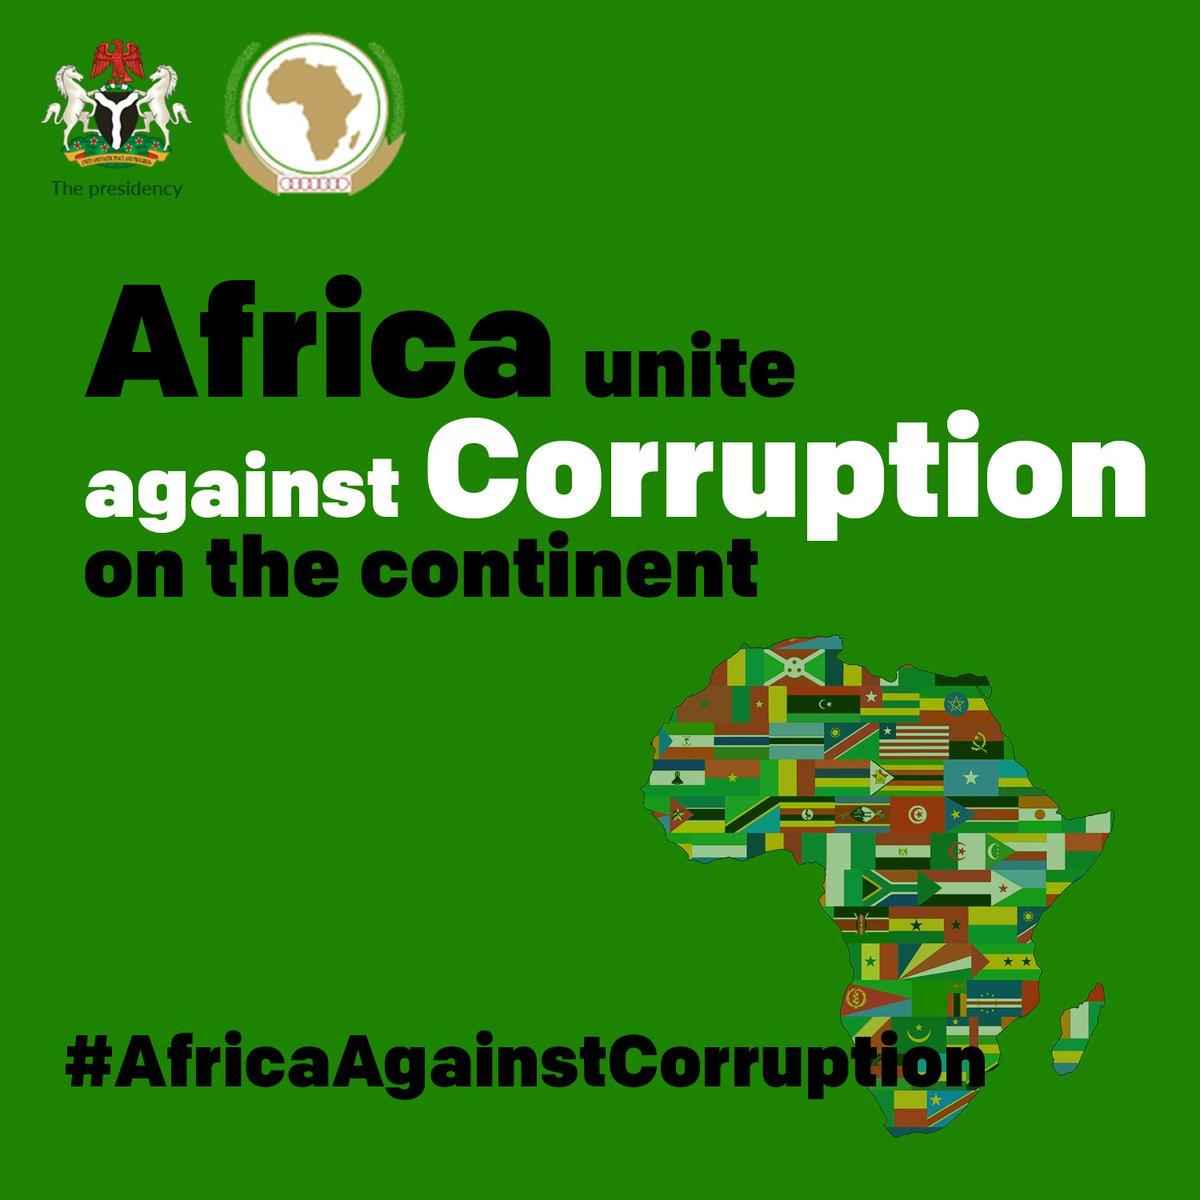 ONE in Nigeria on Twitter: